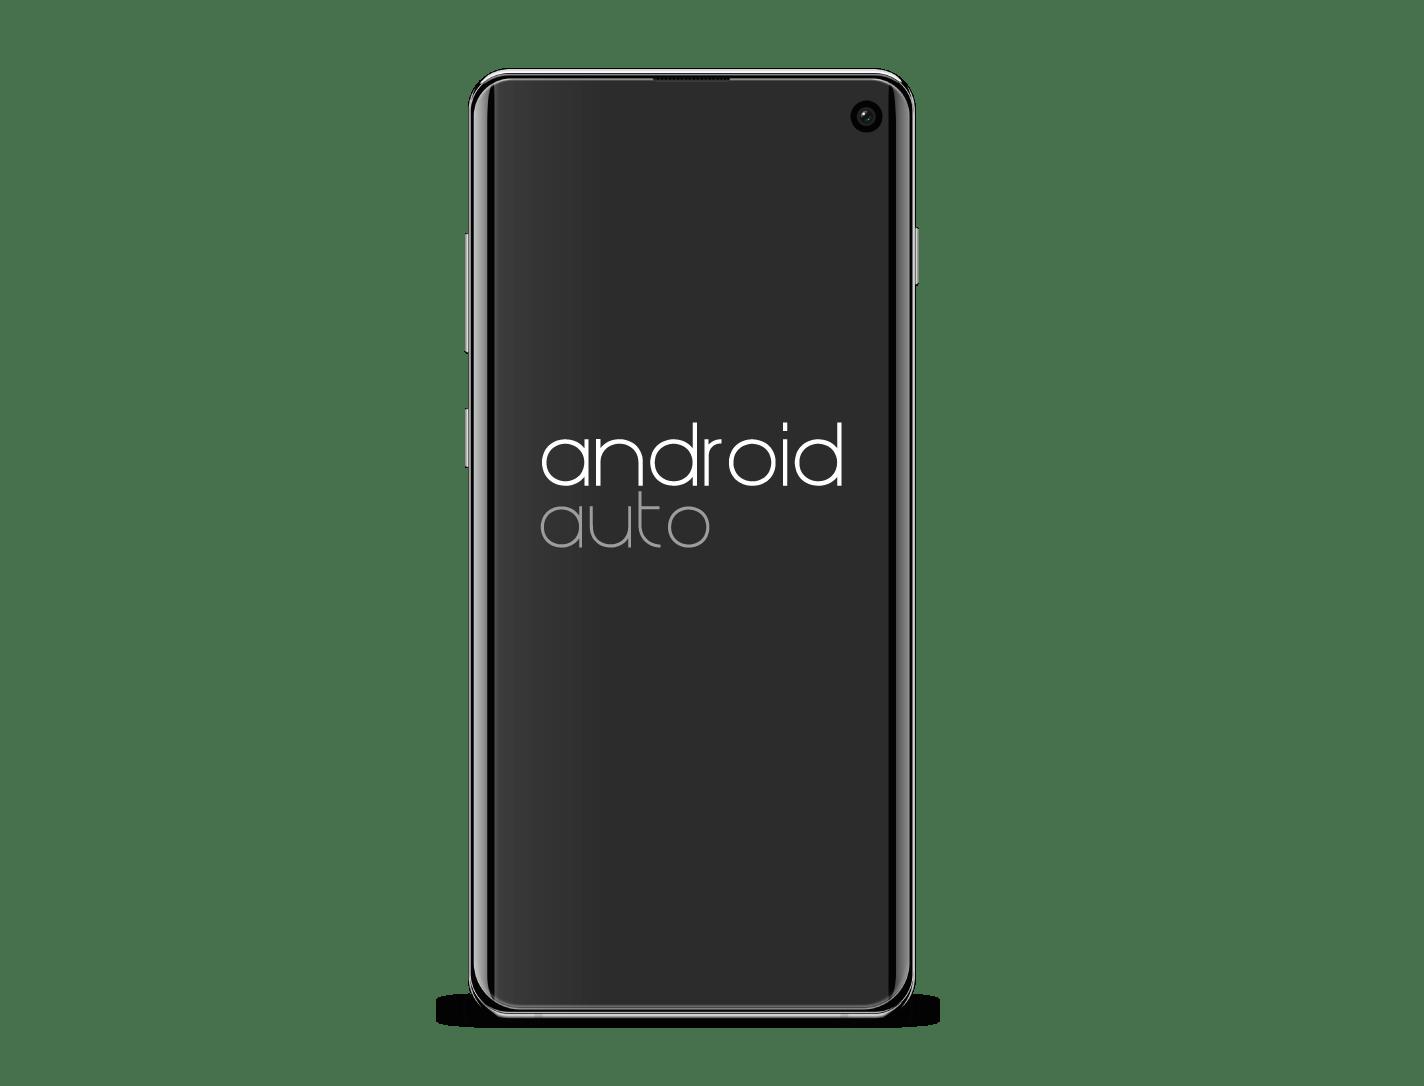 sviluppo app ecosistema android iOS